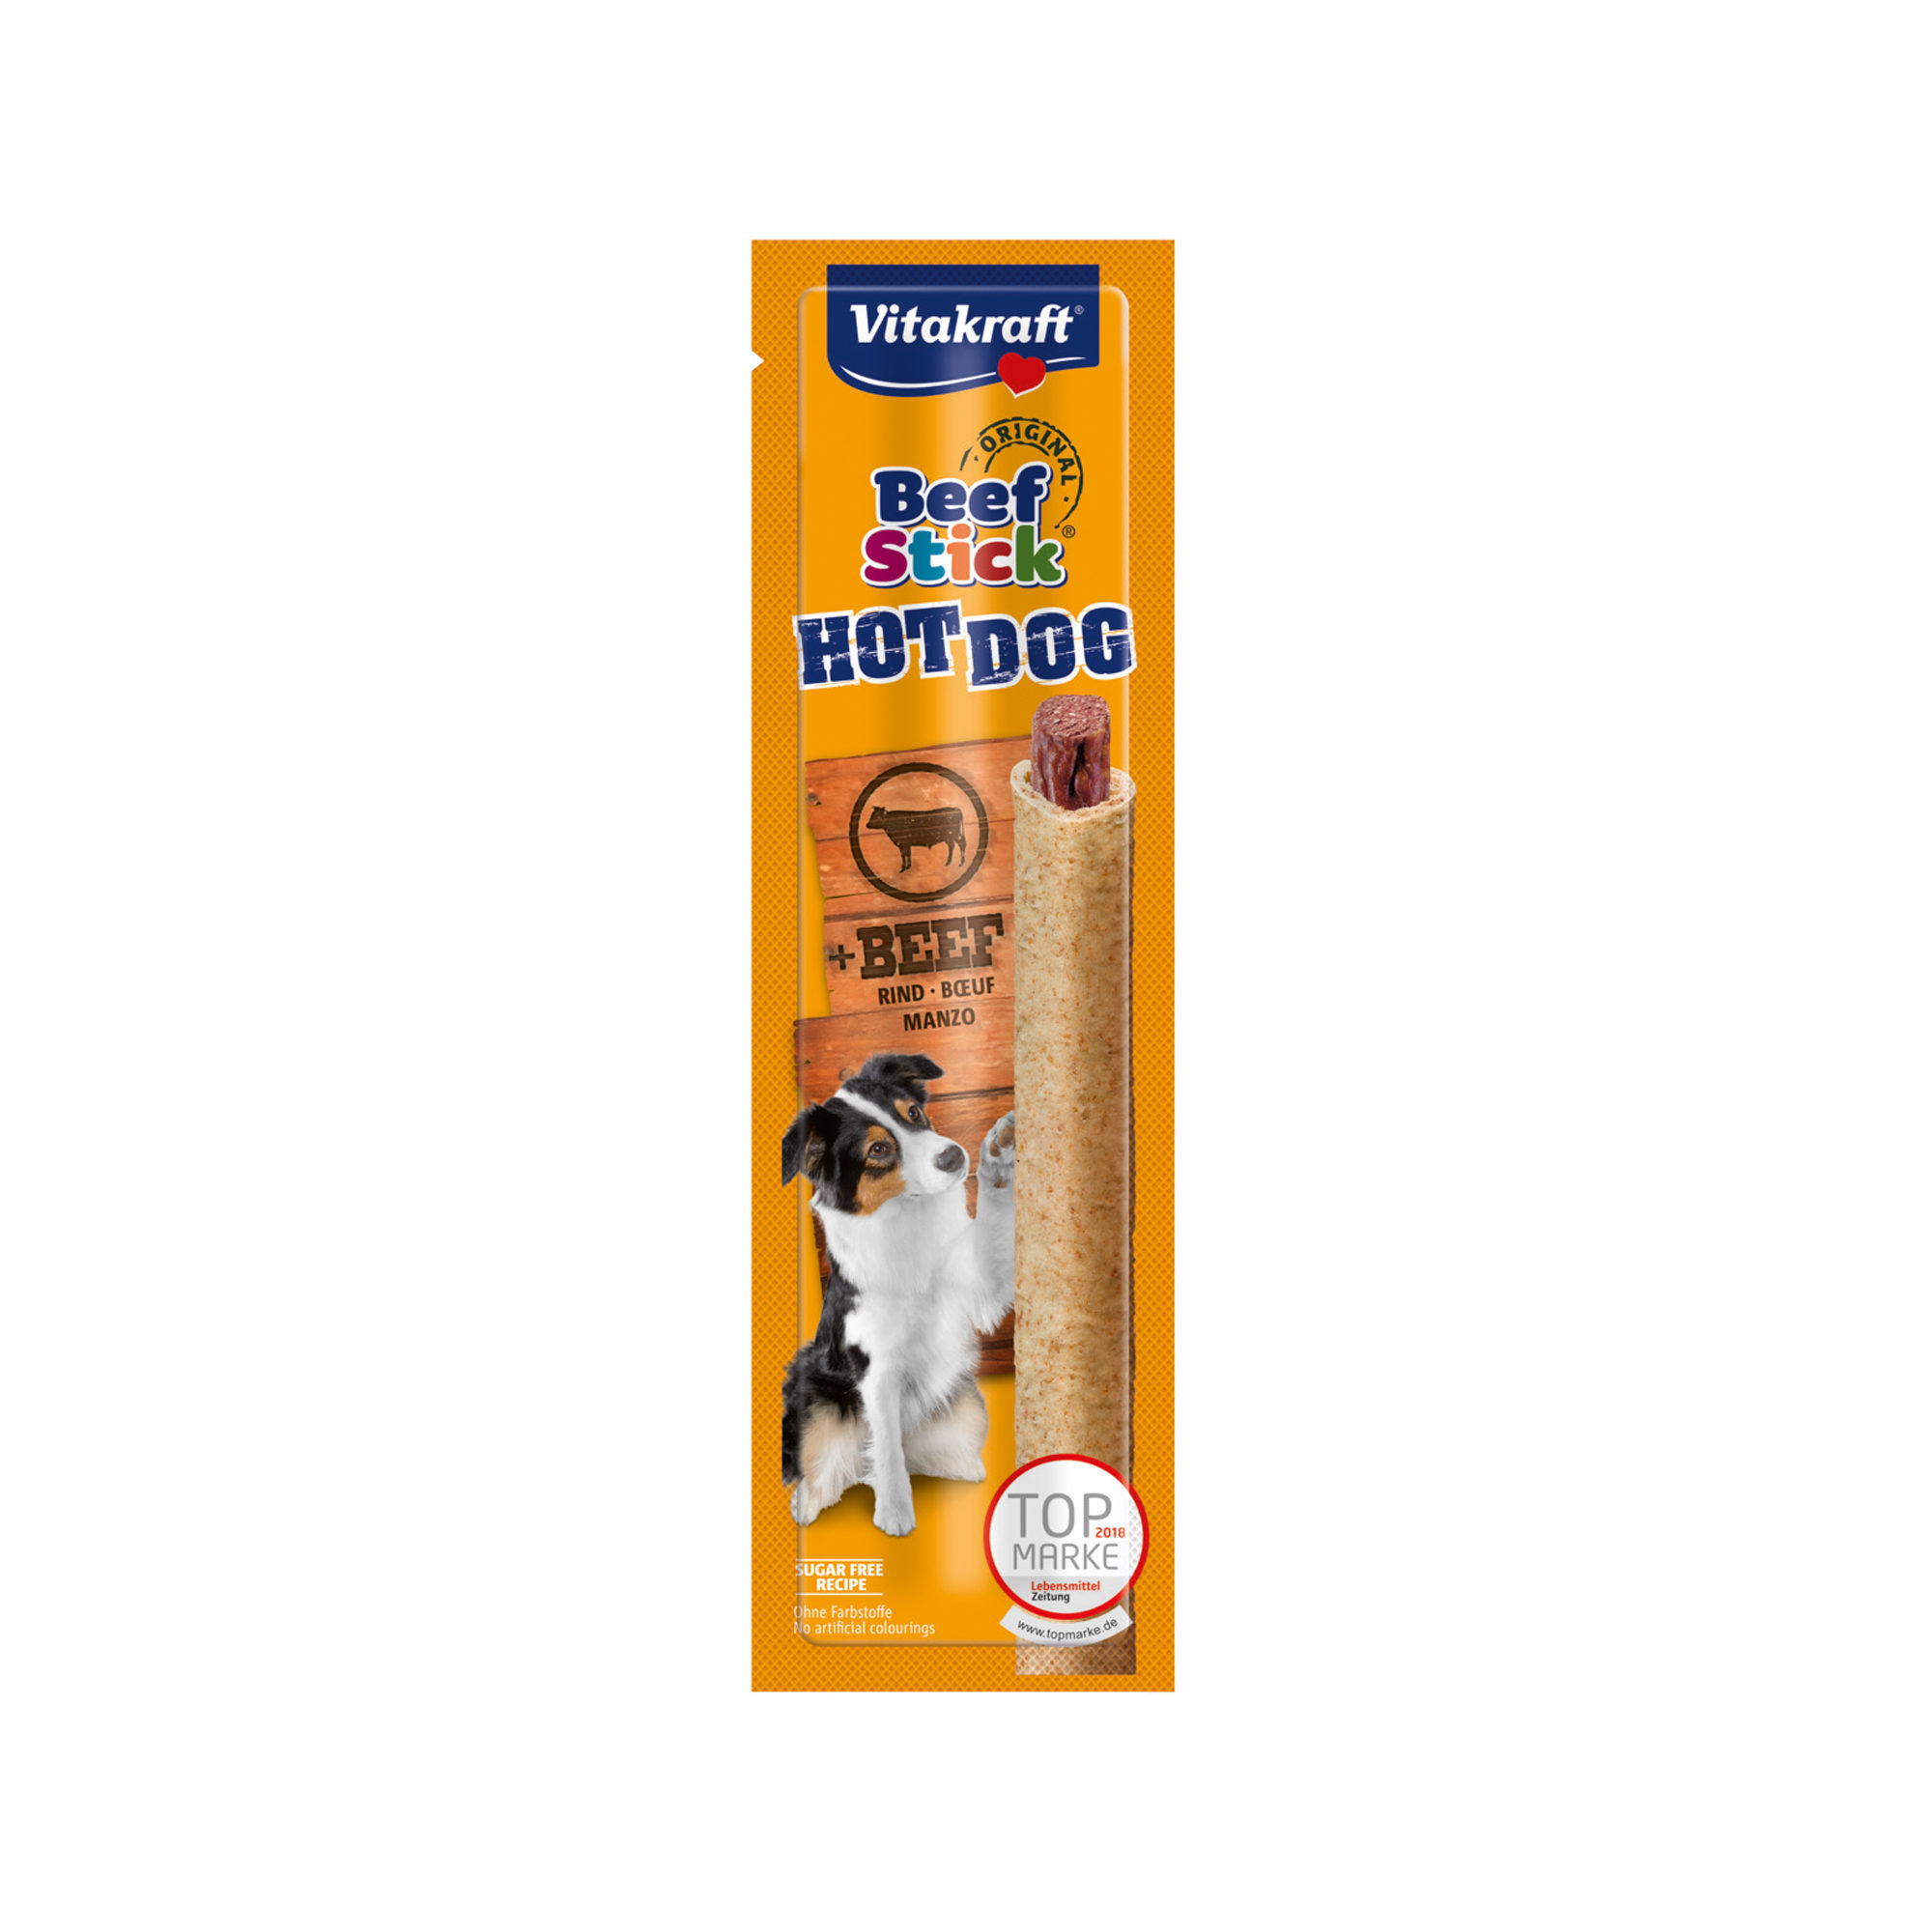 Vitakraft Beef Stick - Hot Dog